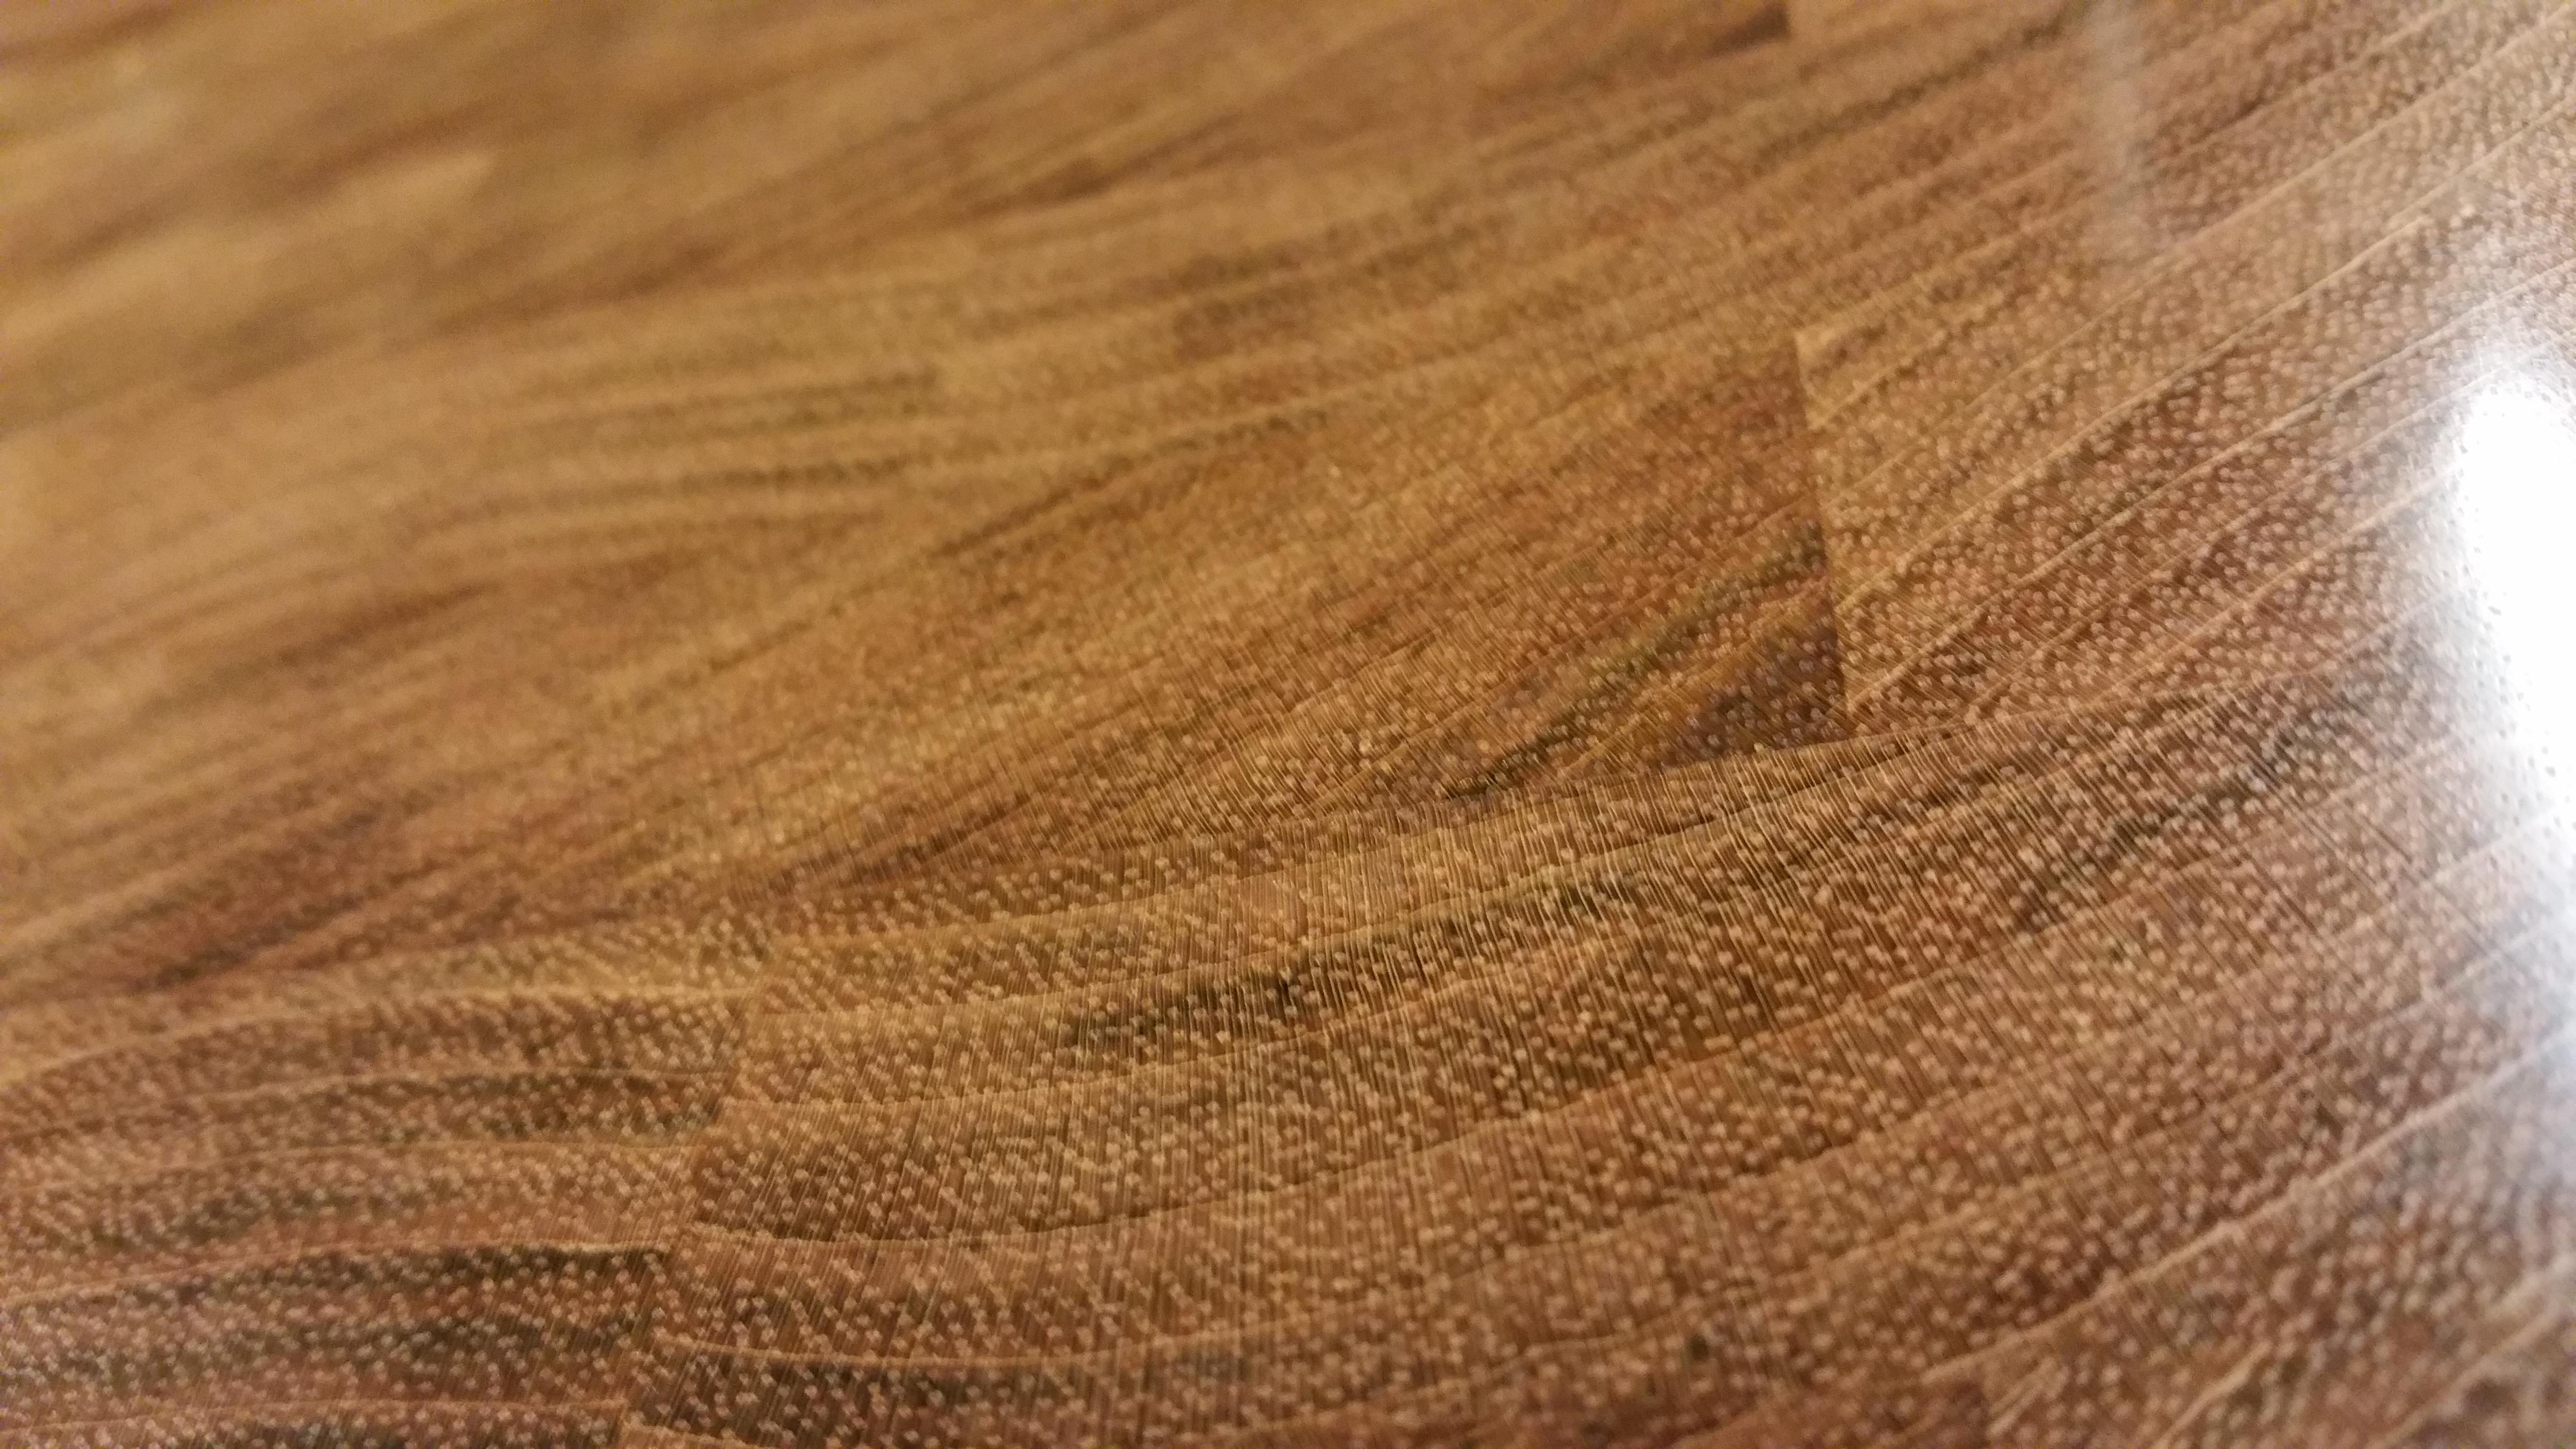 Closeup of Brazilian Cherry Butcher Block Cutting Board Grain